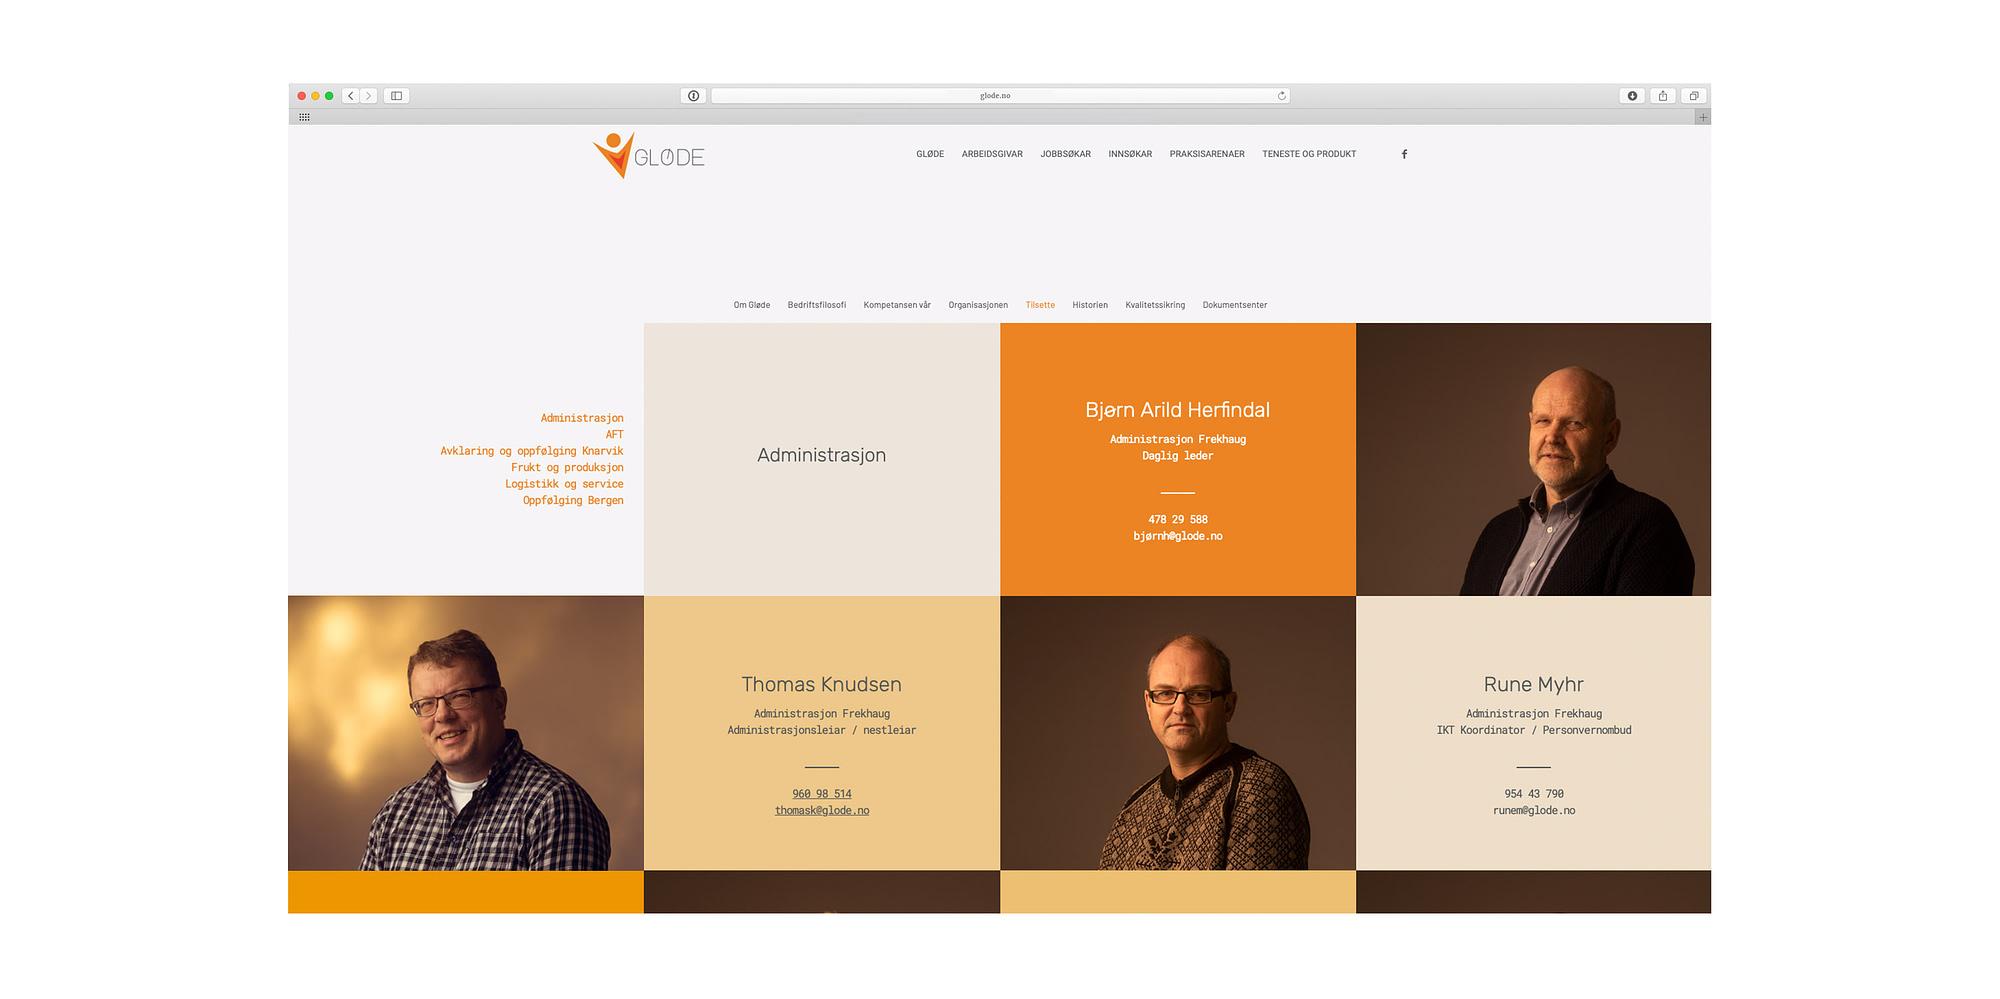 Ny hjemmeside tilpasset mobil for Gløde